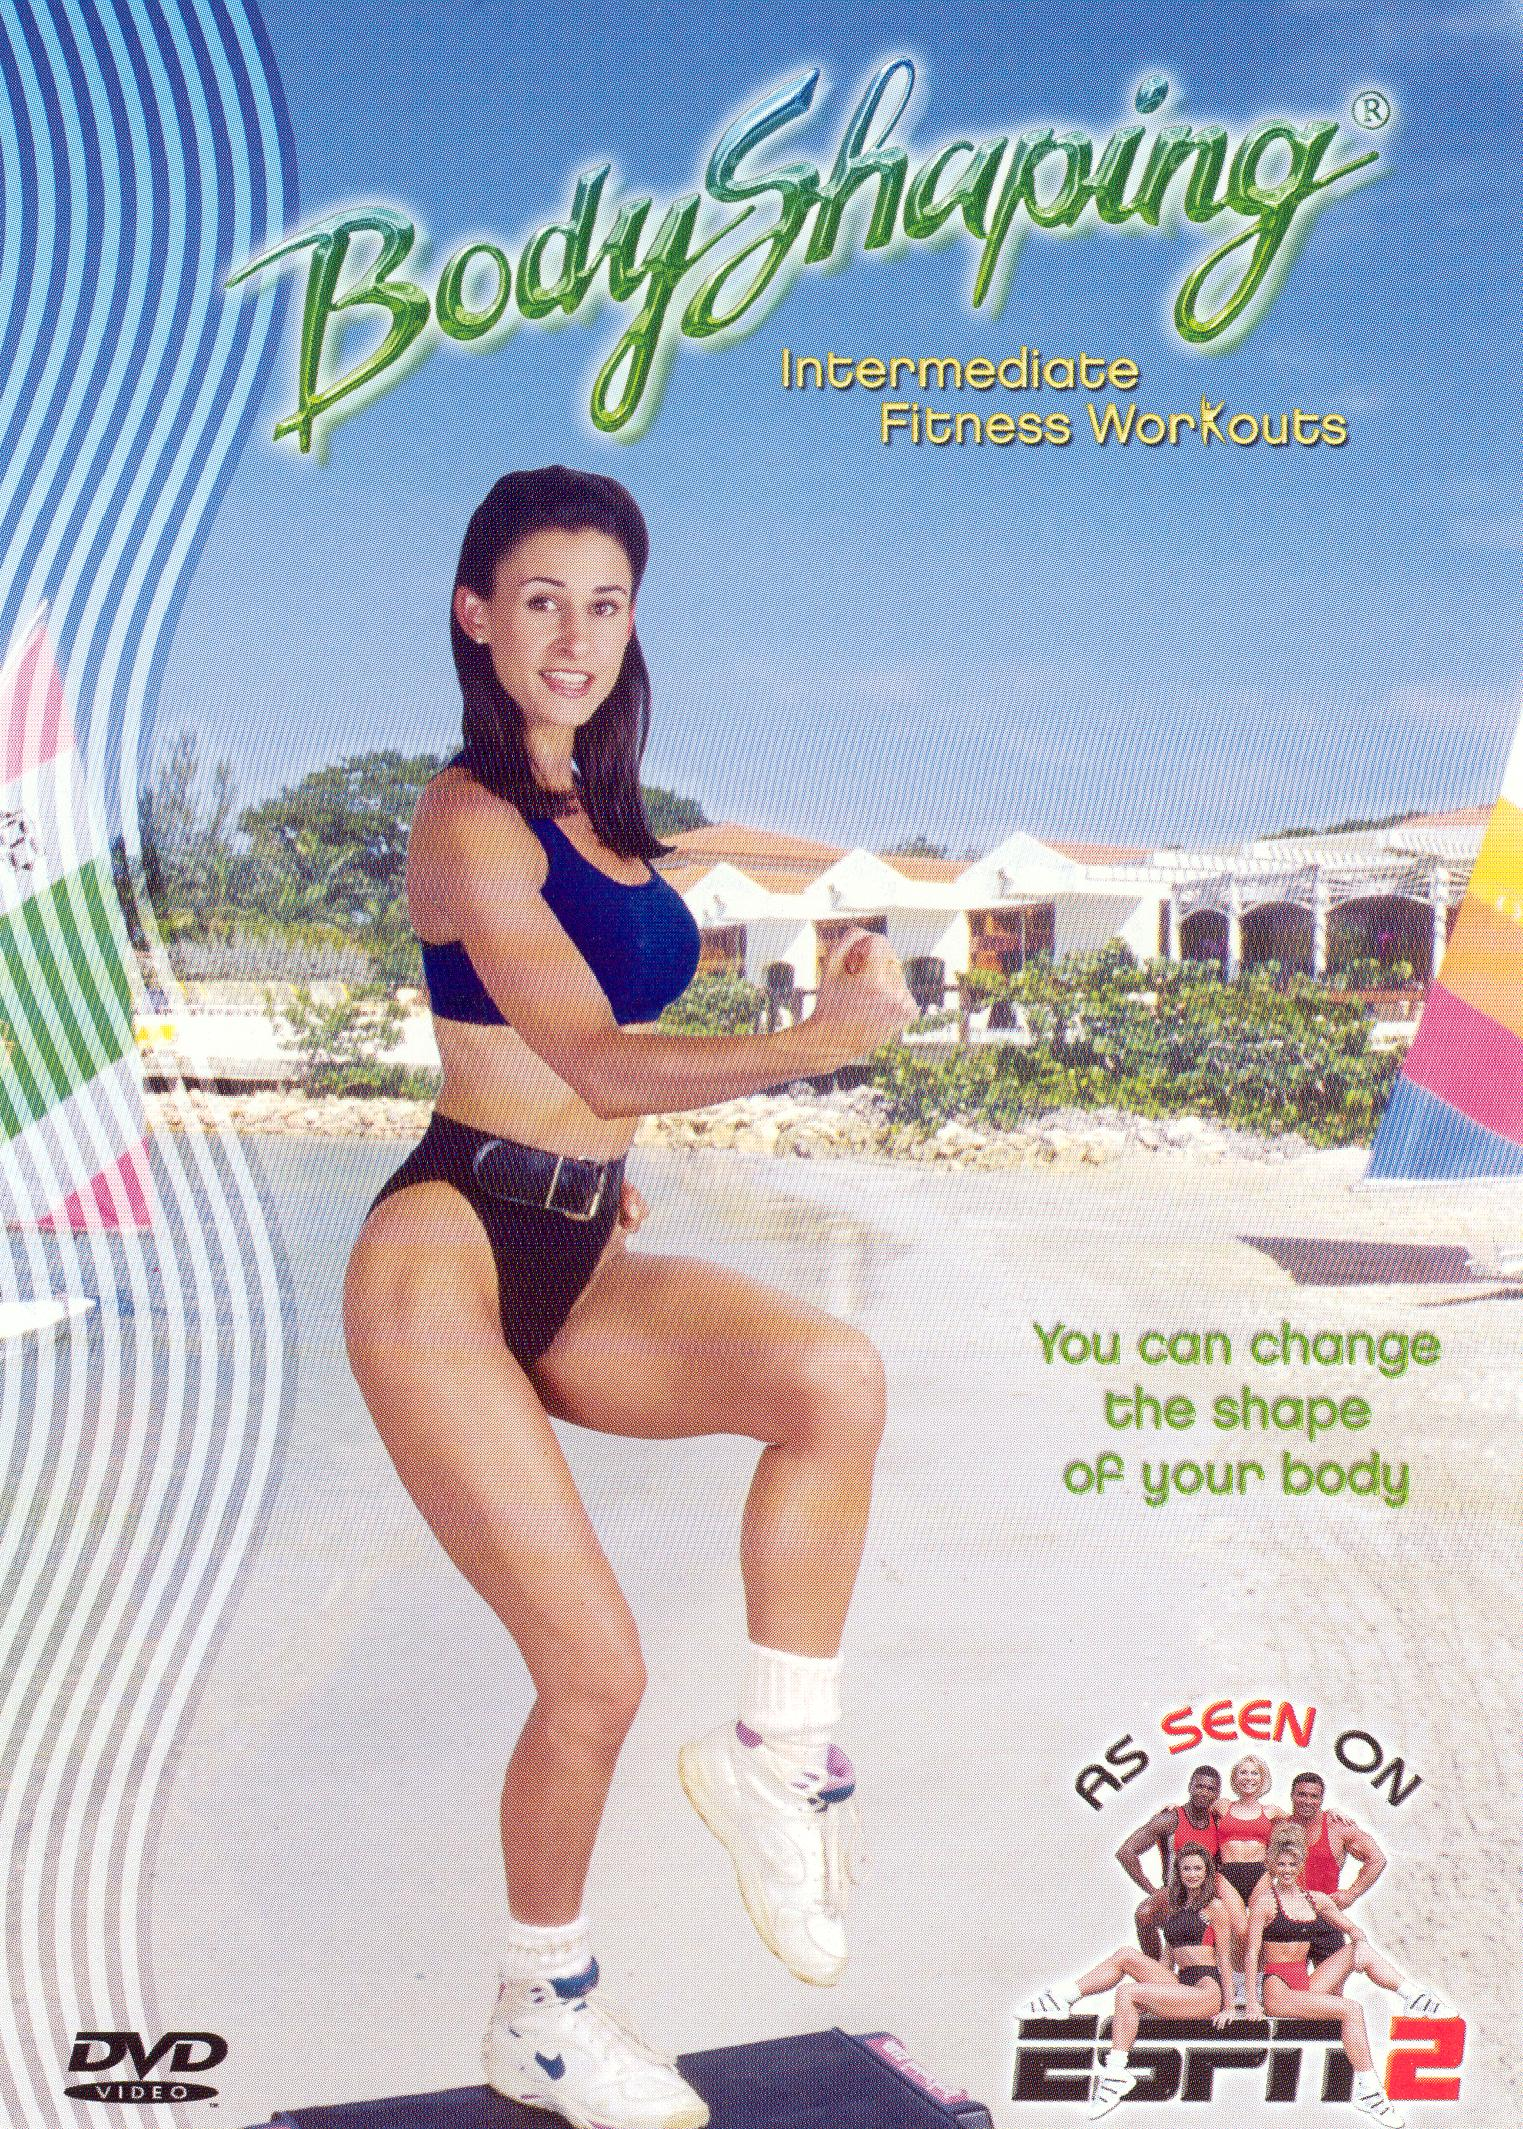 ESPN: BodyShaping - Intermediate Fitness Workout